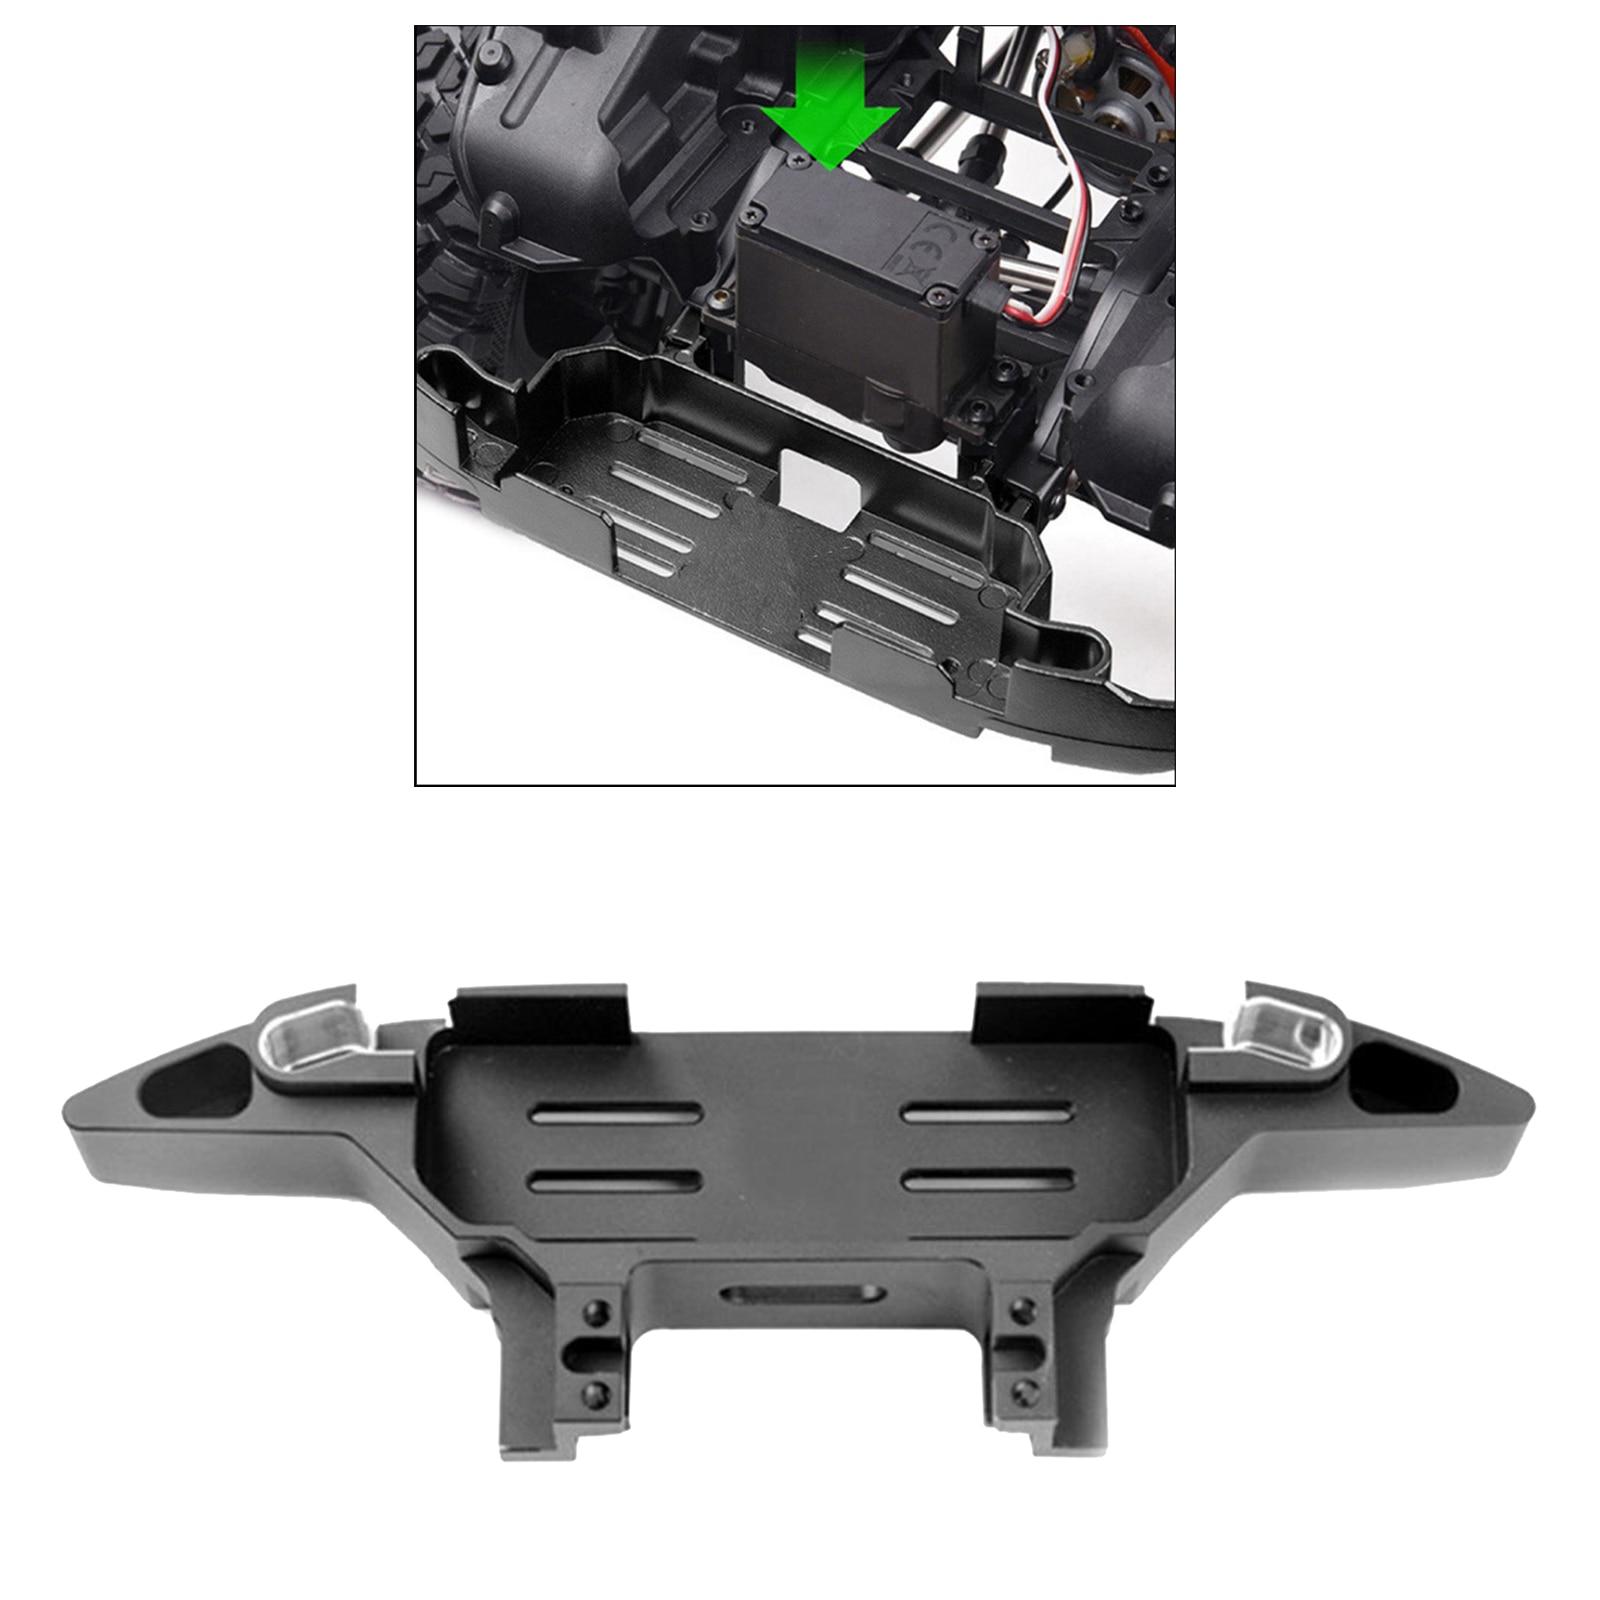 1 Pieces 1/10 Scale RC Car Spare Parts fits for Crawler TRX4 TRX4,SCX10 enlarge